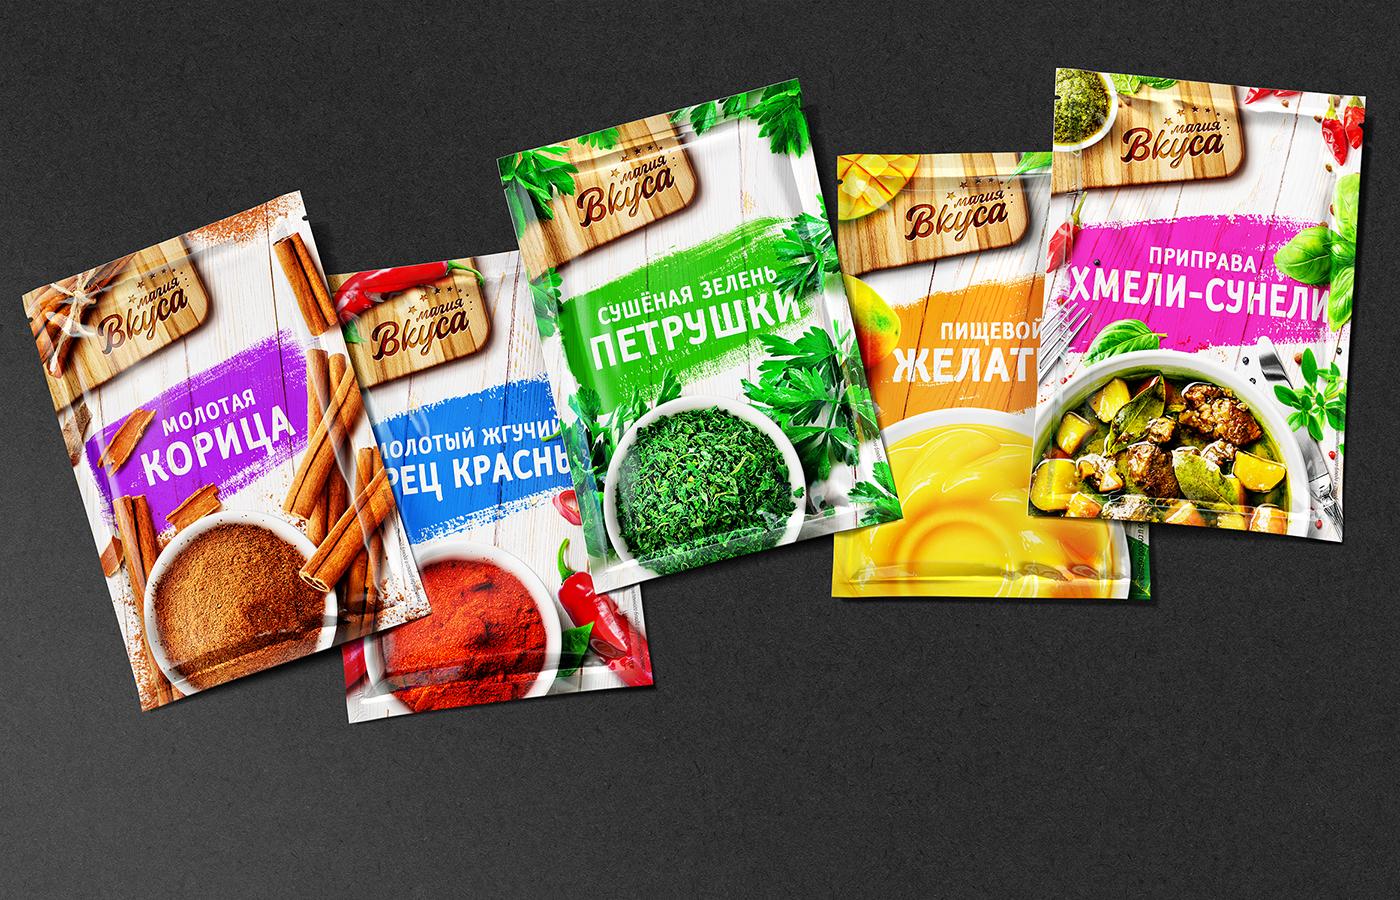 Packaging design of spices Magiya vkusa